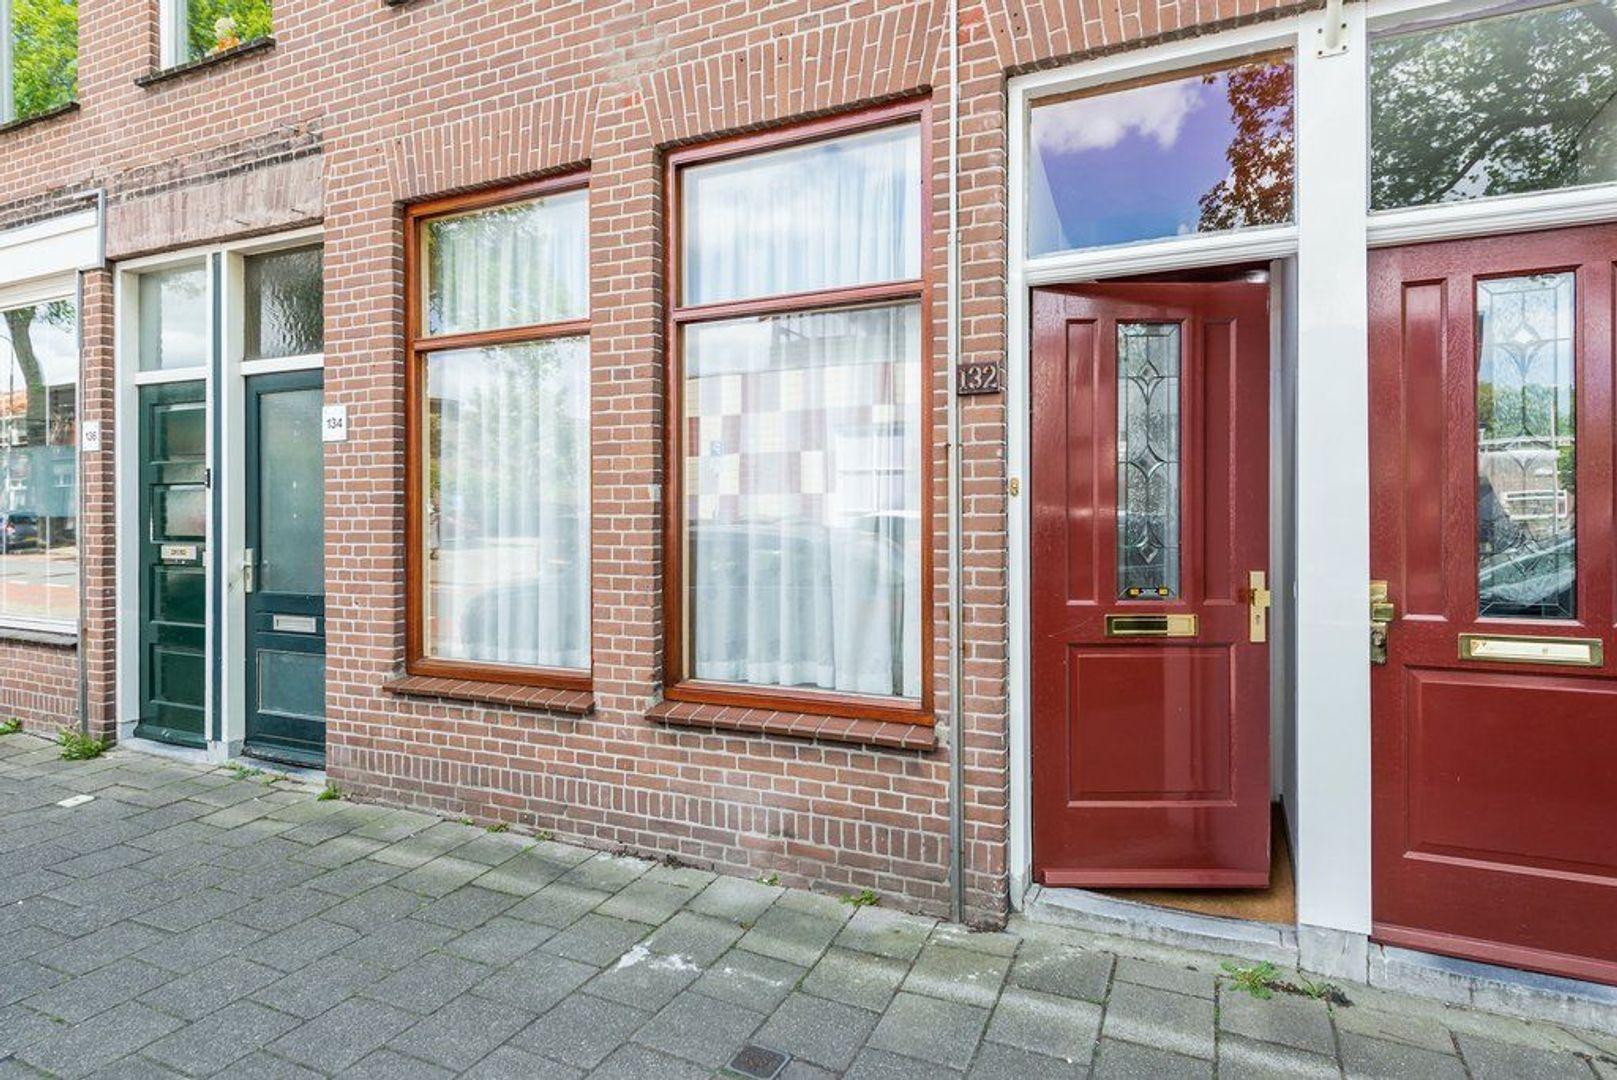 Brasserskade 132, Delft foto-1